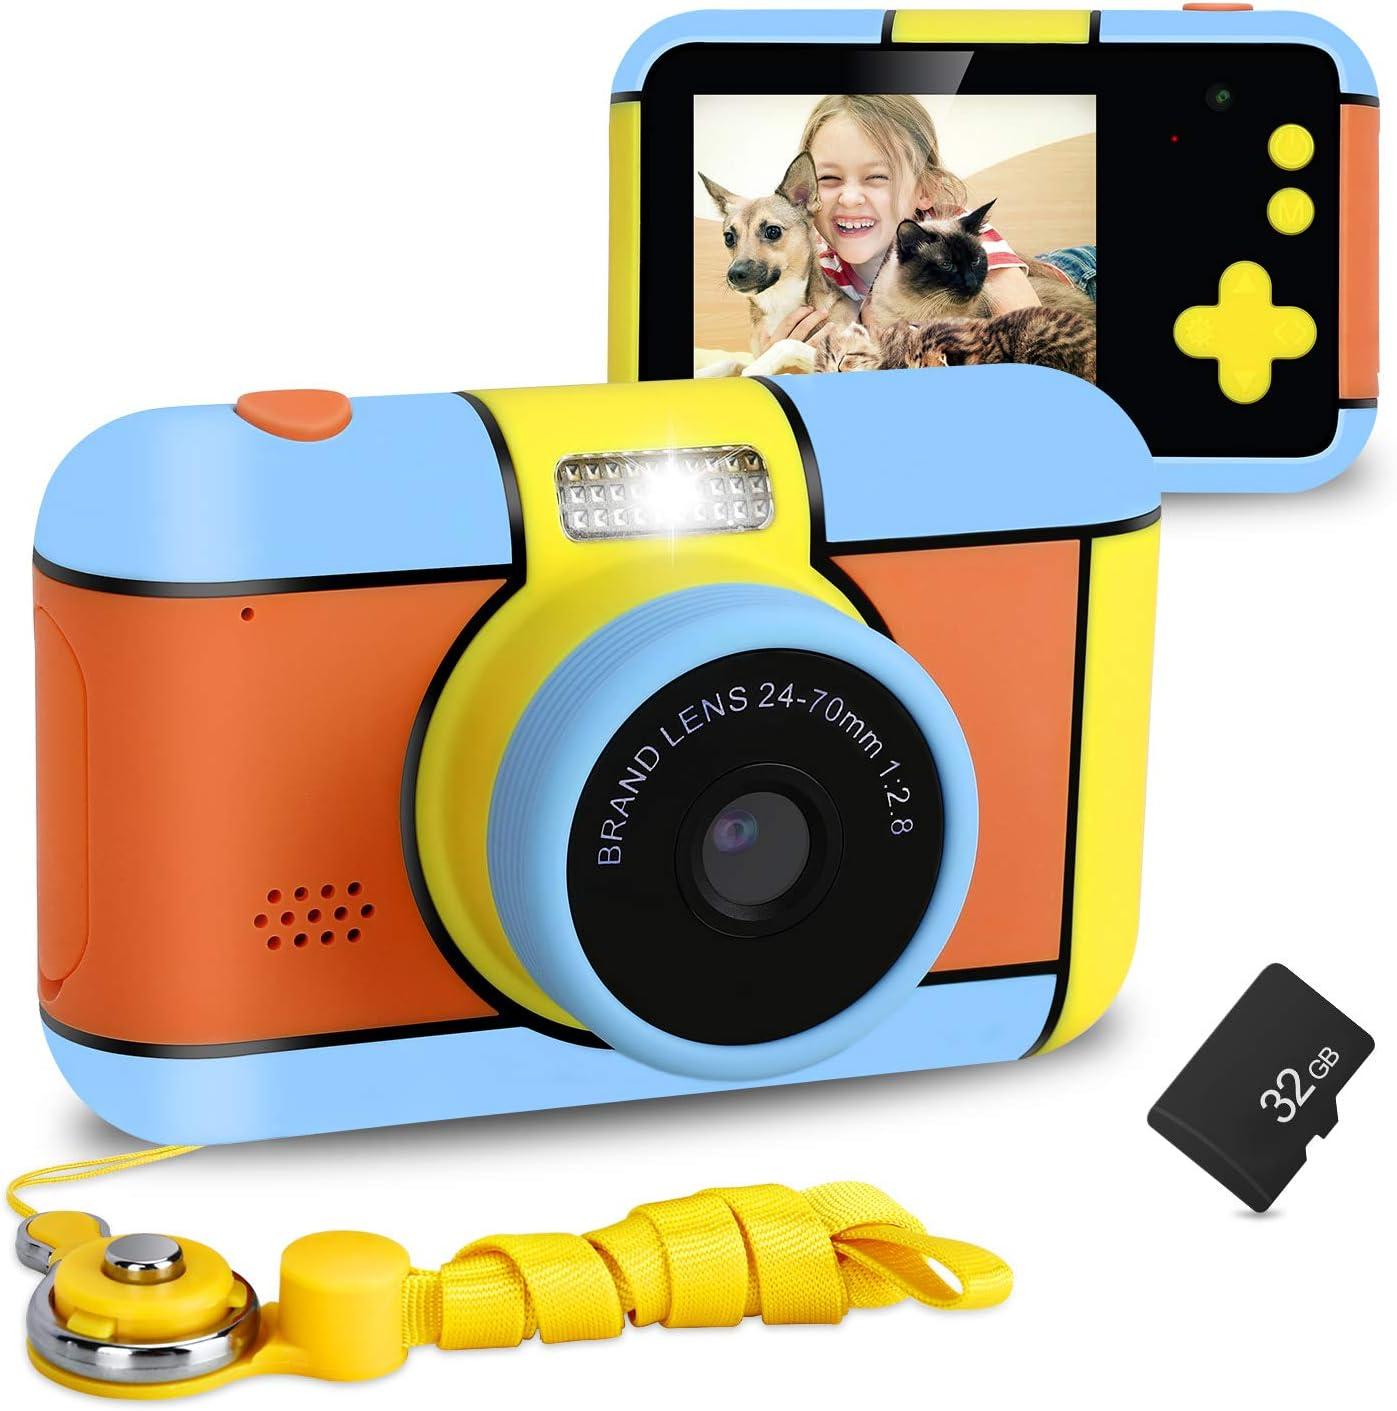 Amazon.es: XDDIAS Cámara para Niños, Infantil Cámara de Fotos ...